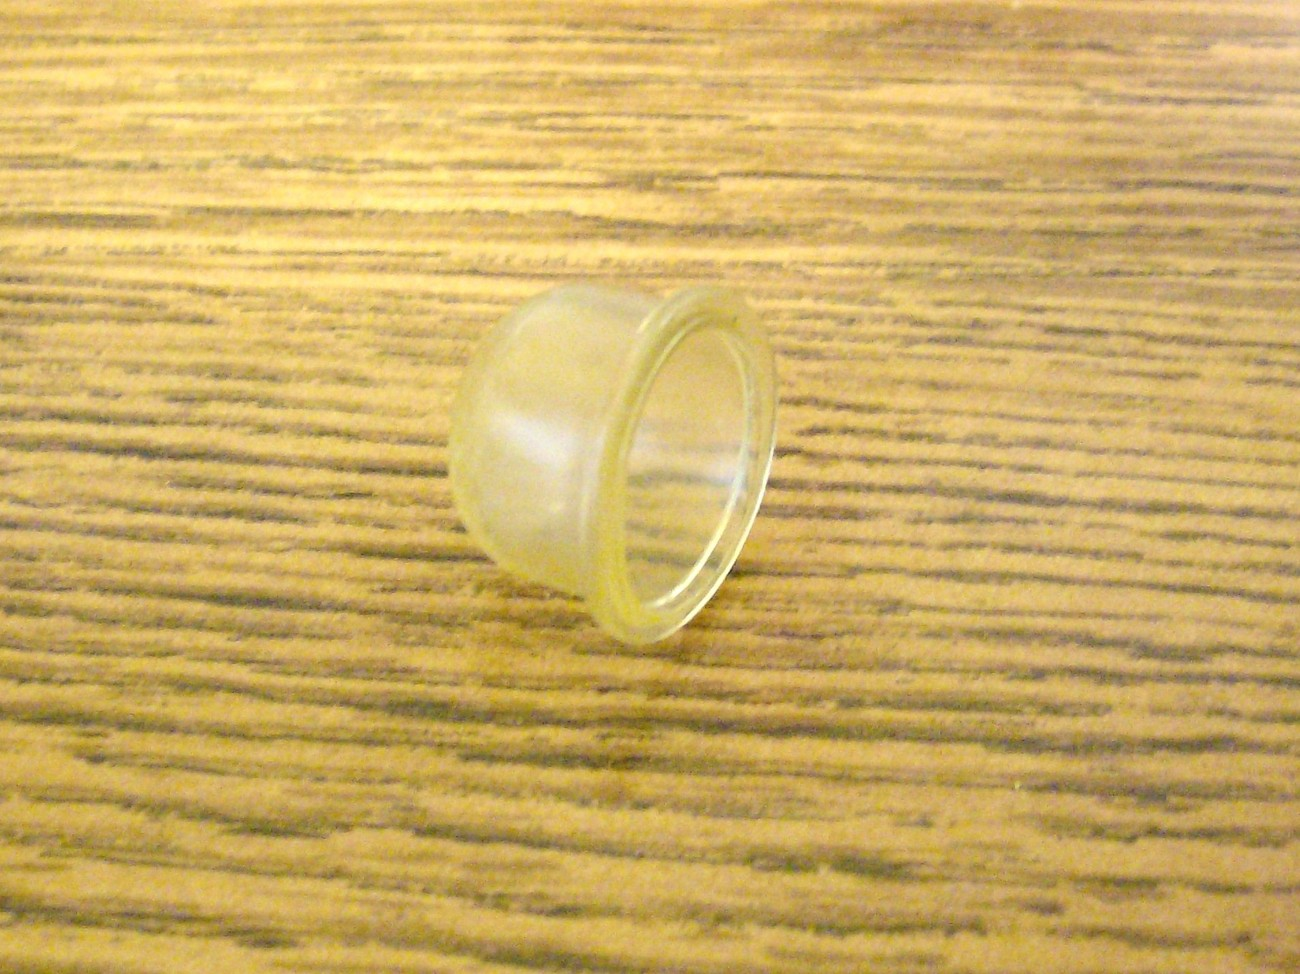 Walbro Primer Bulb fits Stihl trimmer and leaf blower, 41331212700